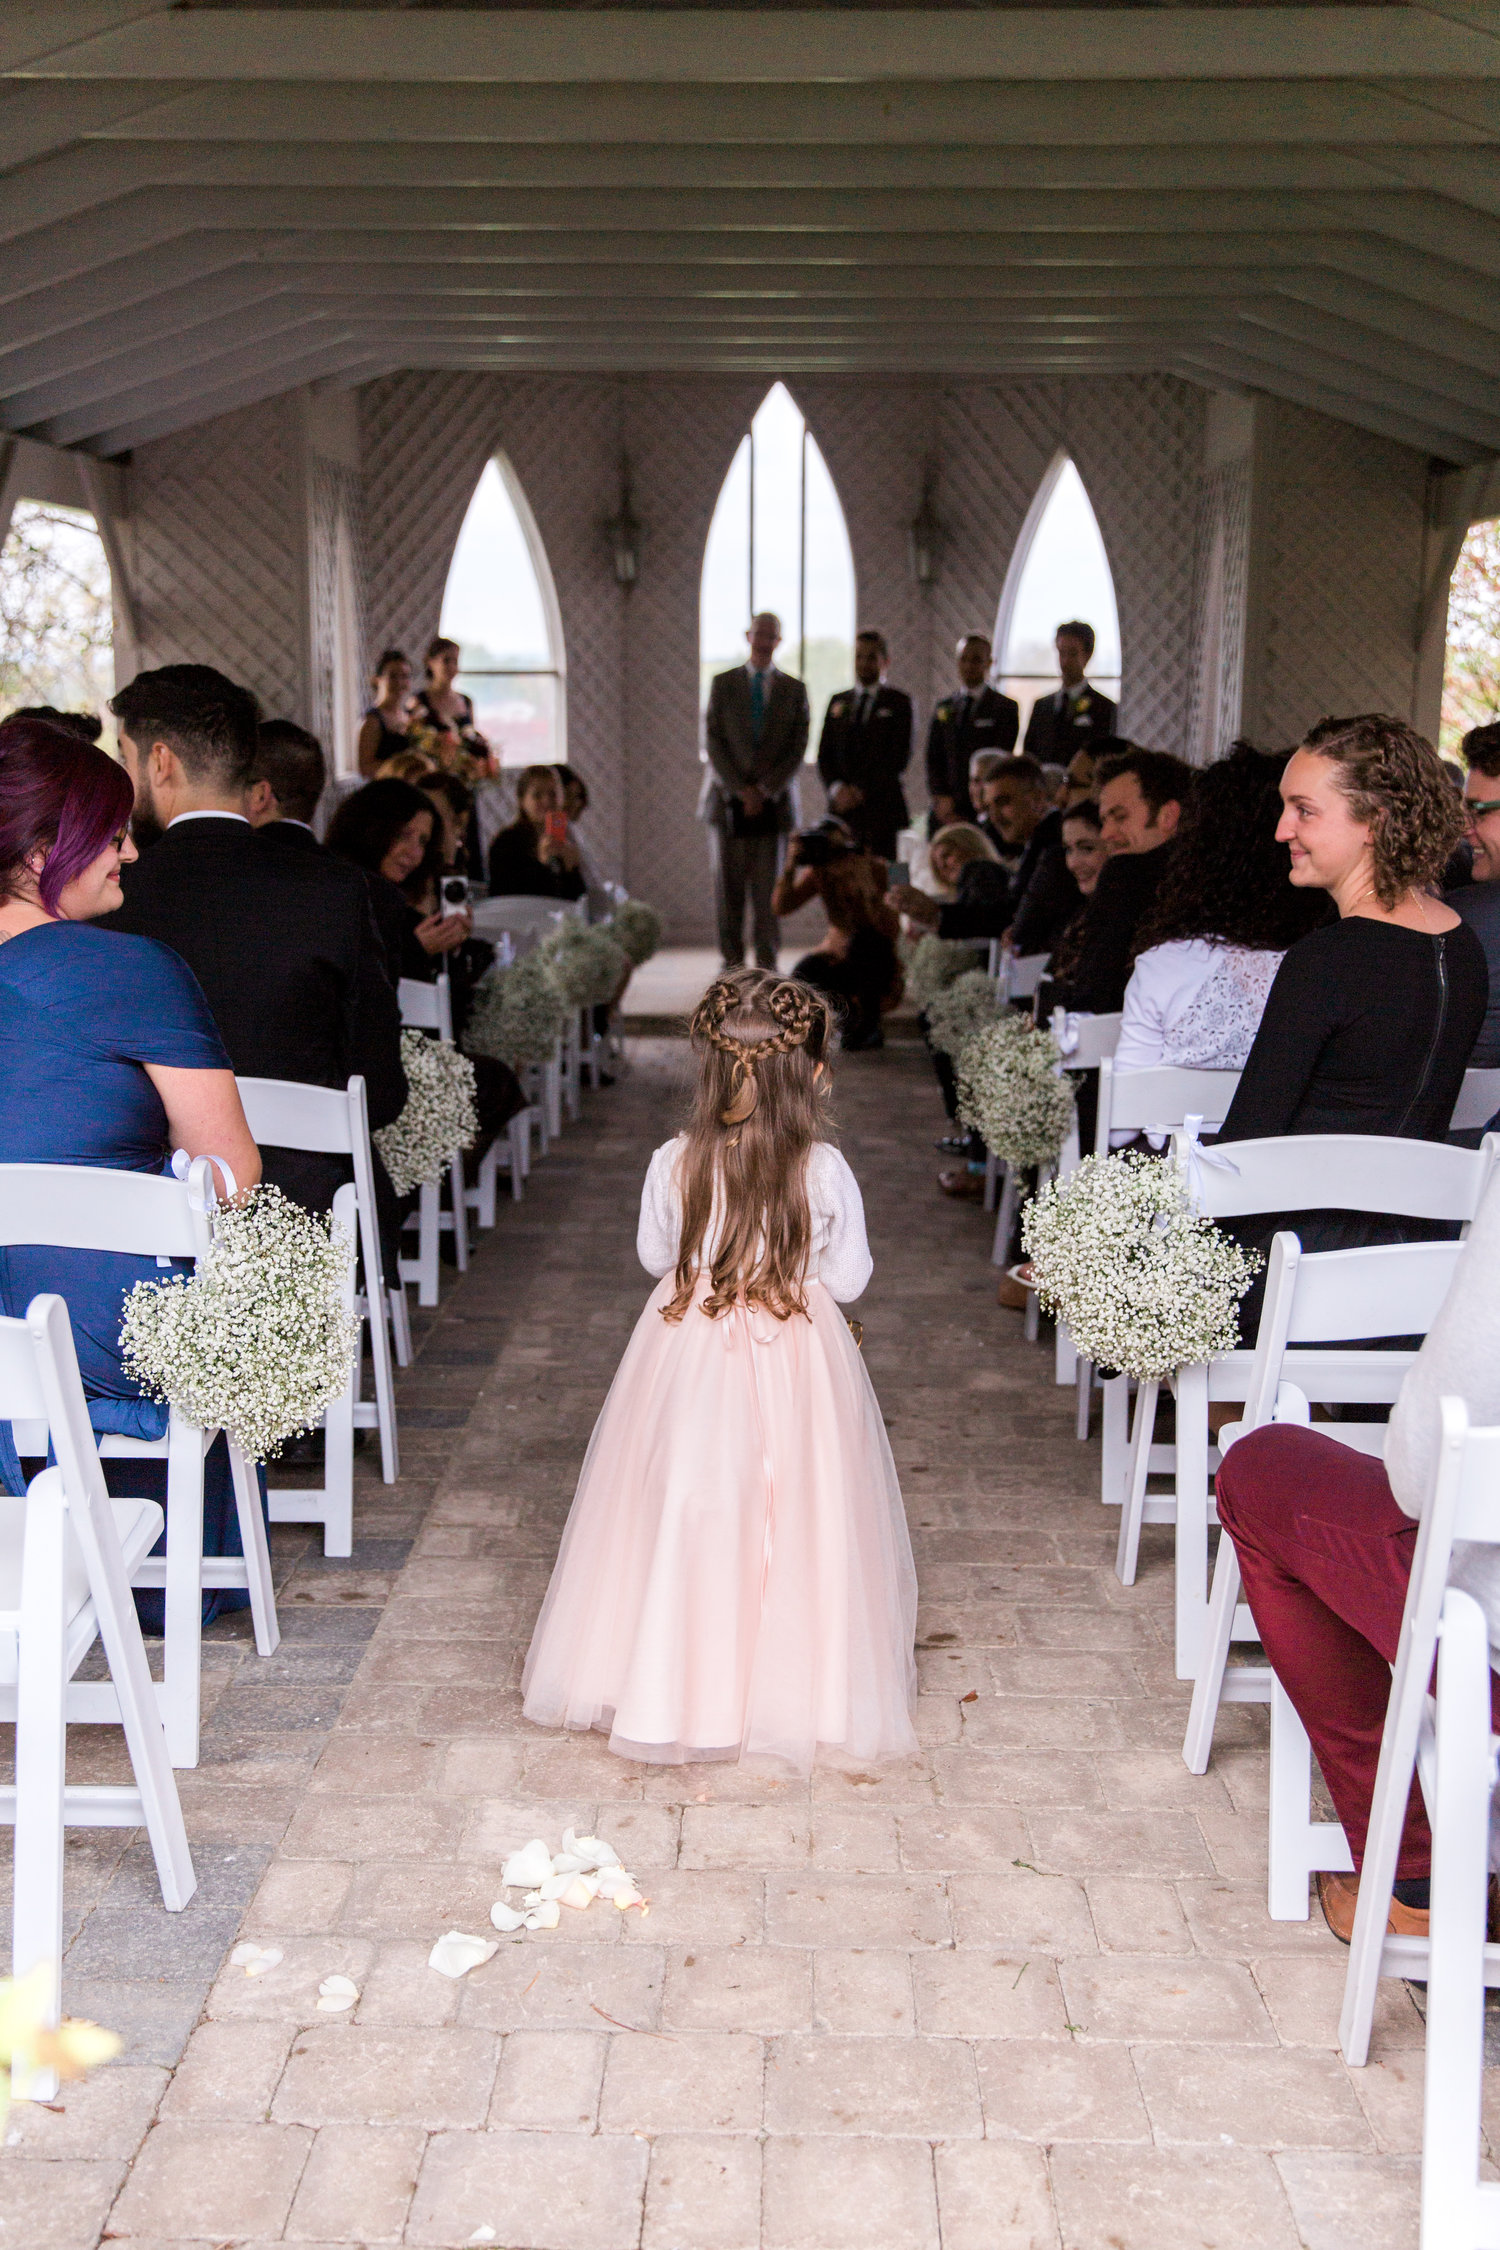 Amir-Golbazi-Danielle-Giroux-Photography_Toronto-Wedding_Cedarwood_Rachel-Paul_160.jpg